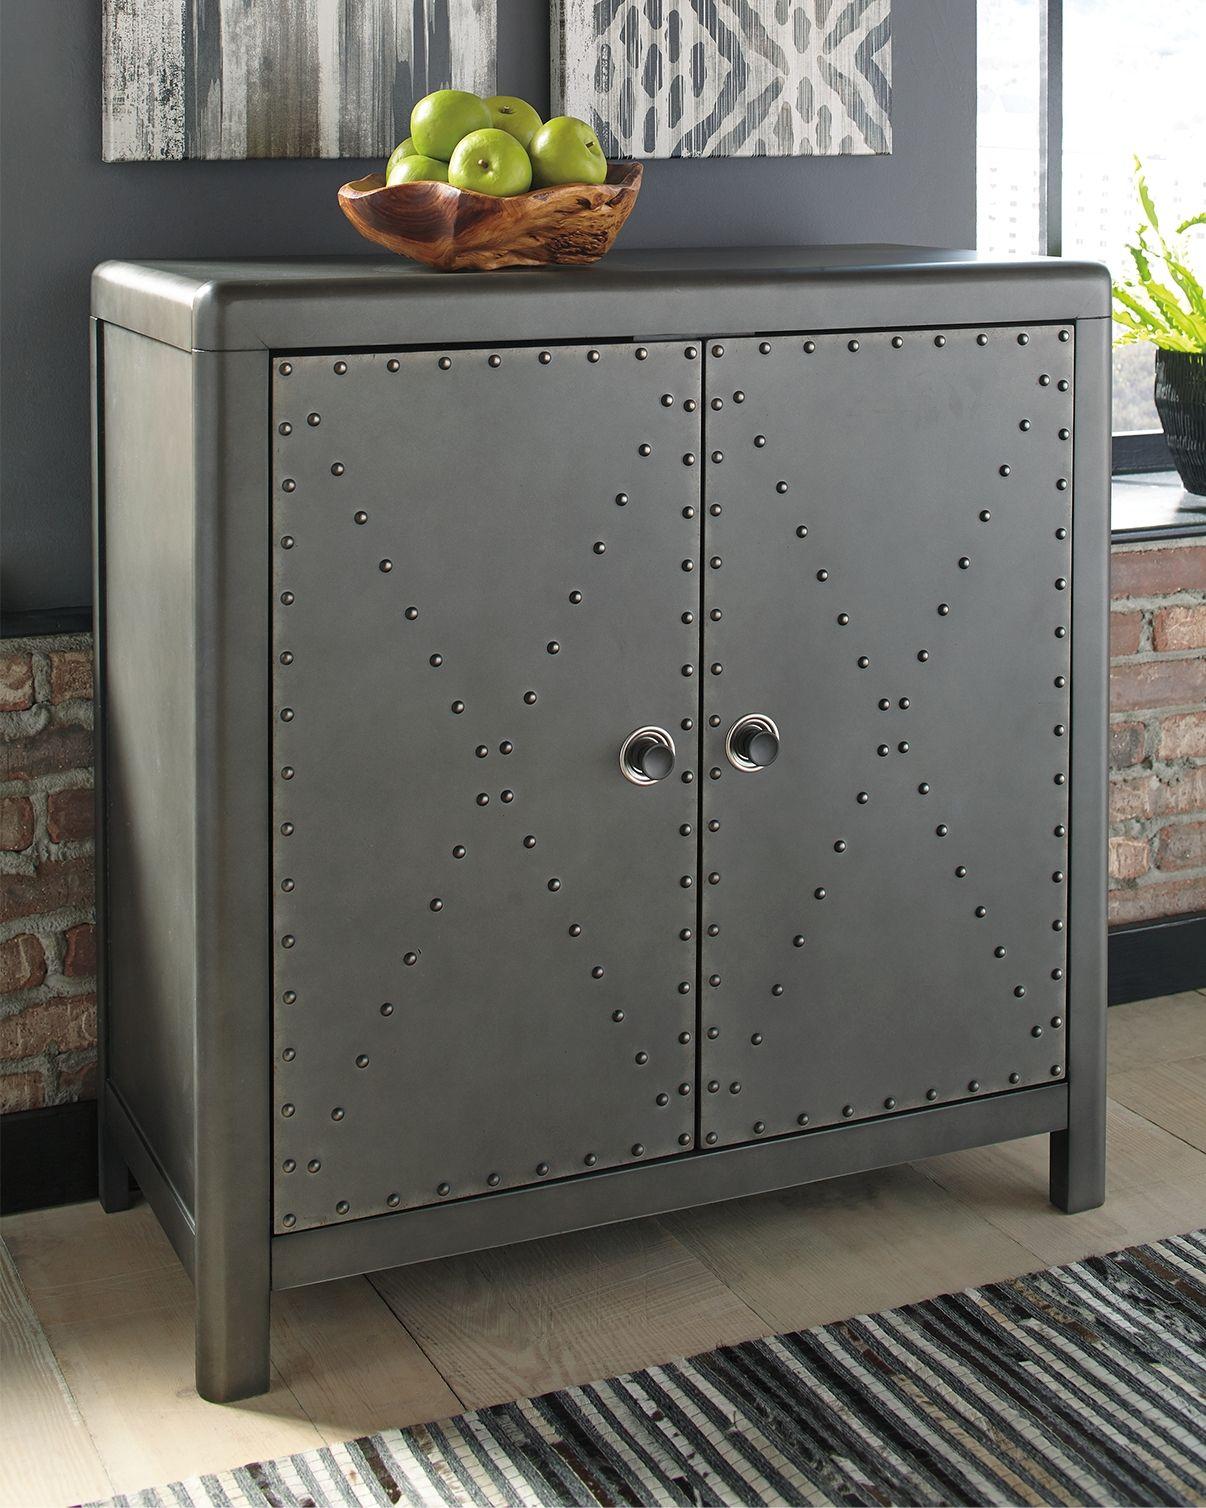 Rock Ridge Accent Cabinet Ashley Furniture Homestore Accent Cabinet Accent Doors Ashley Furniture Industries